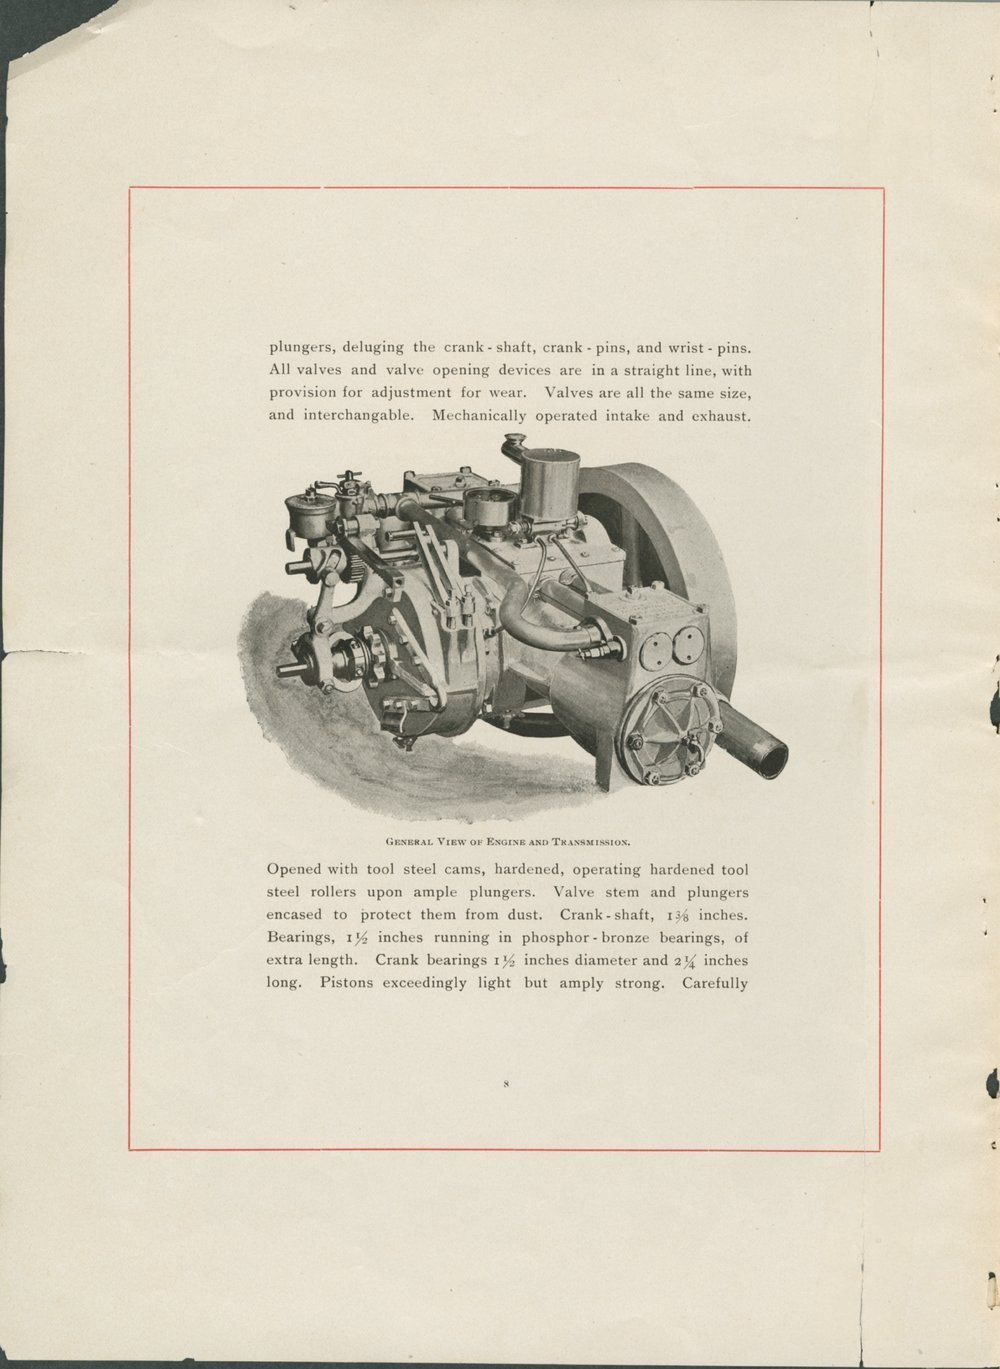 Veracity automobiles. Smith Automobile Company, Topeka, Kansas - 8